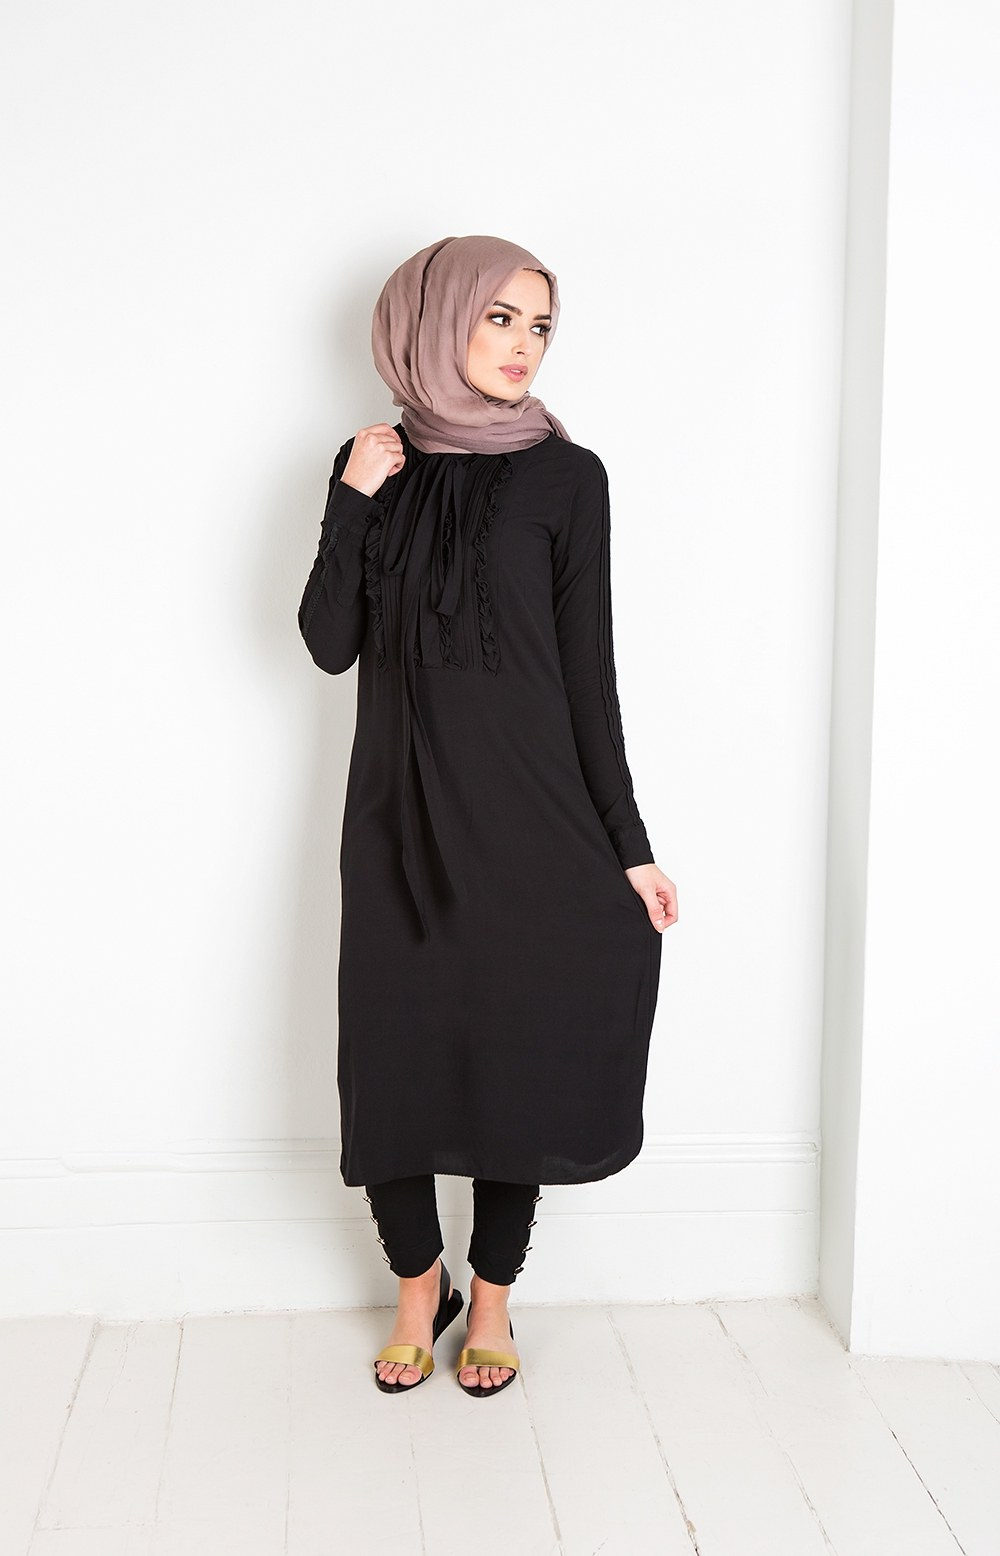 Design Model Baju Lebaran Muslim 2018 E6d5 25 Trend Model Baju Muslim Lebaran 2018 Simple & Modis